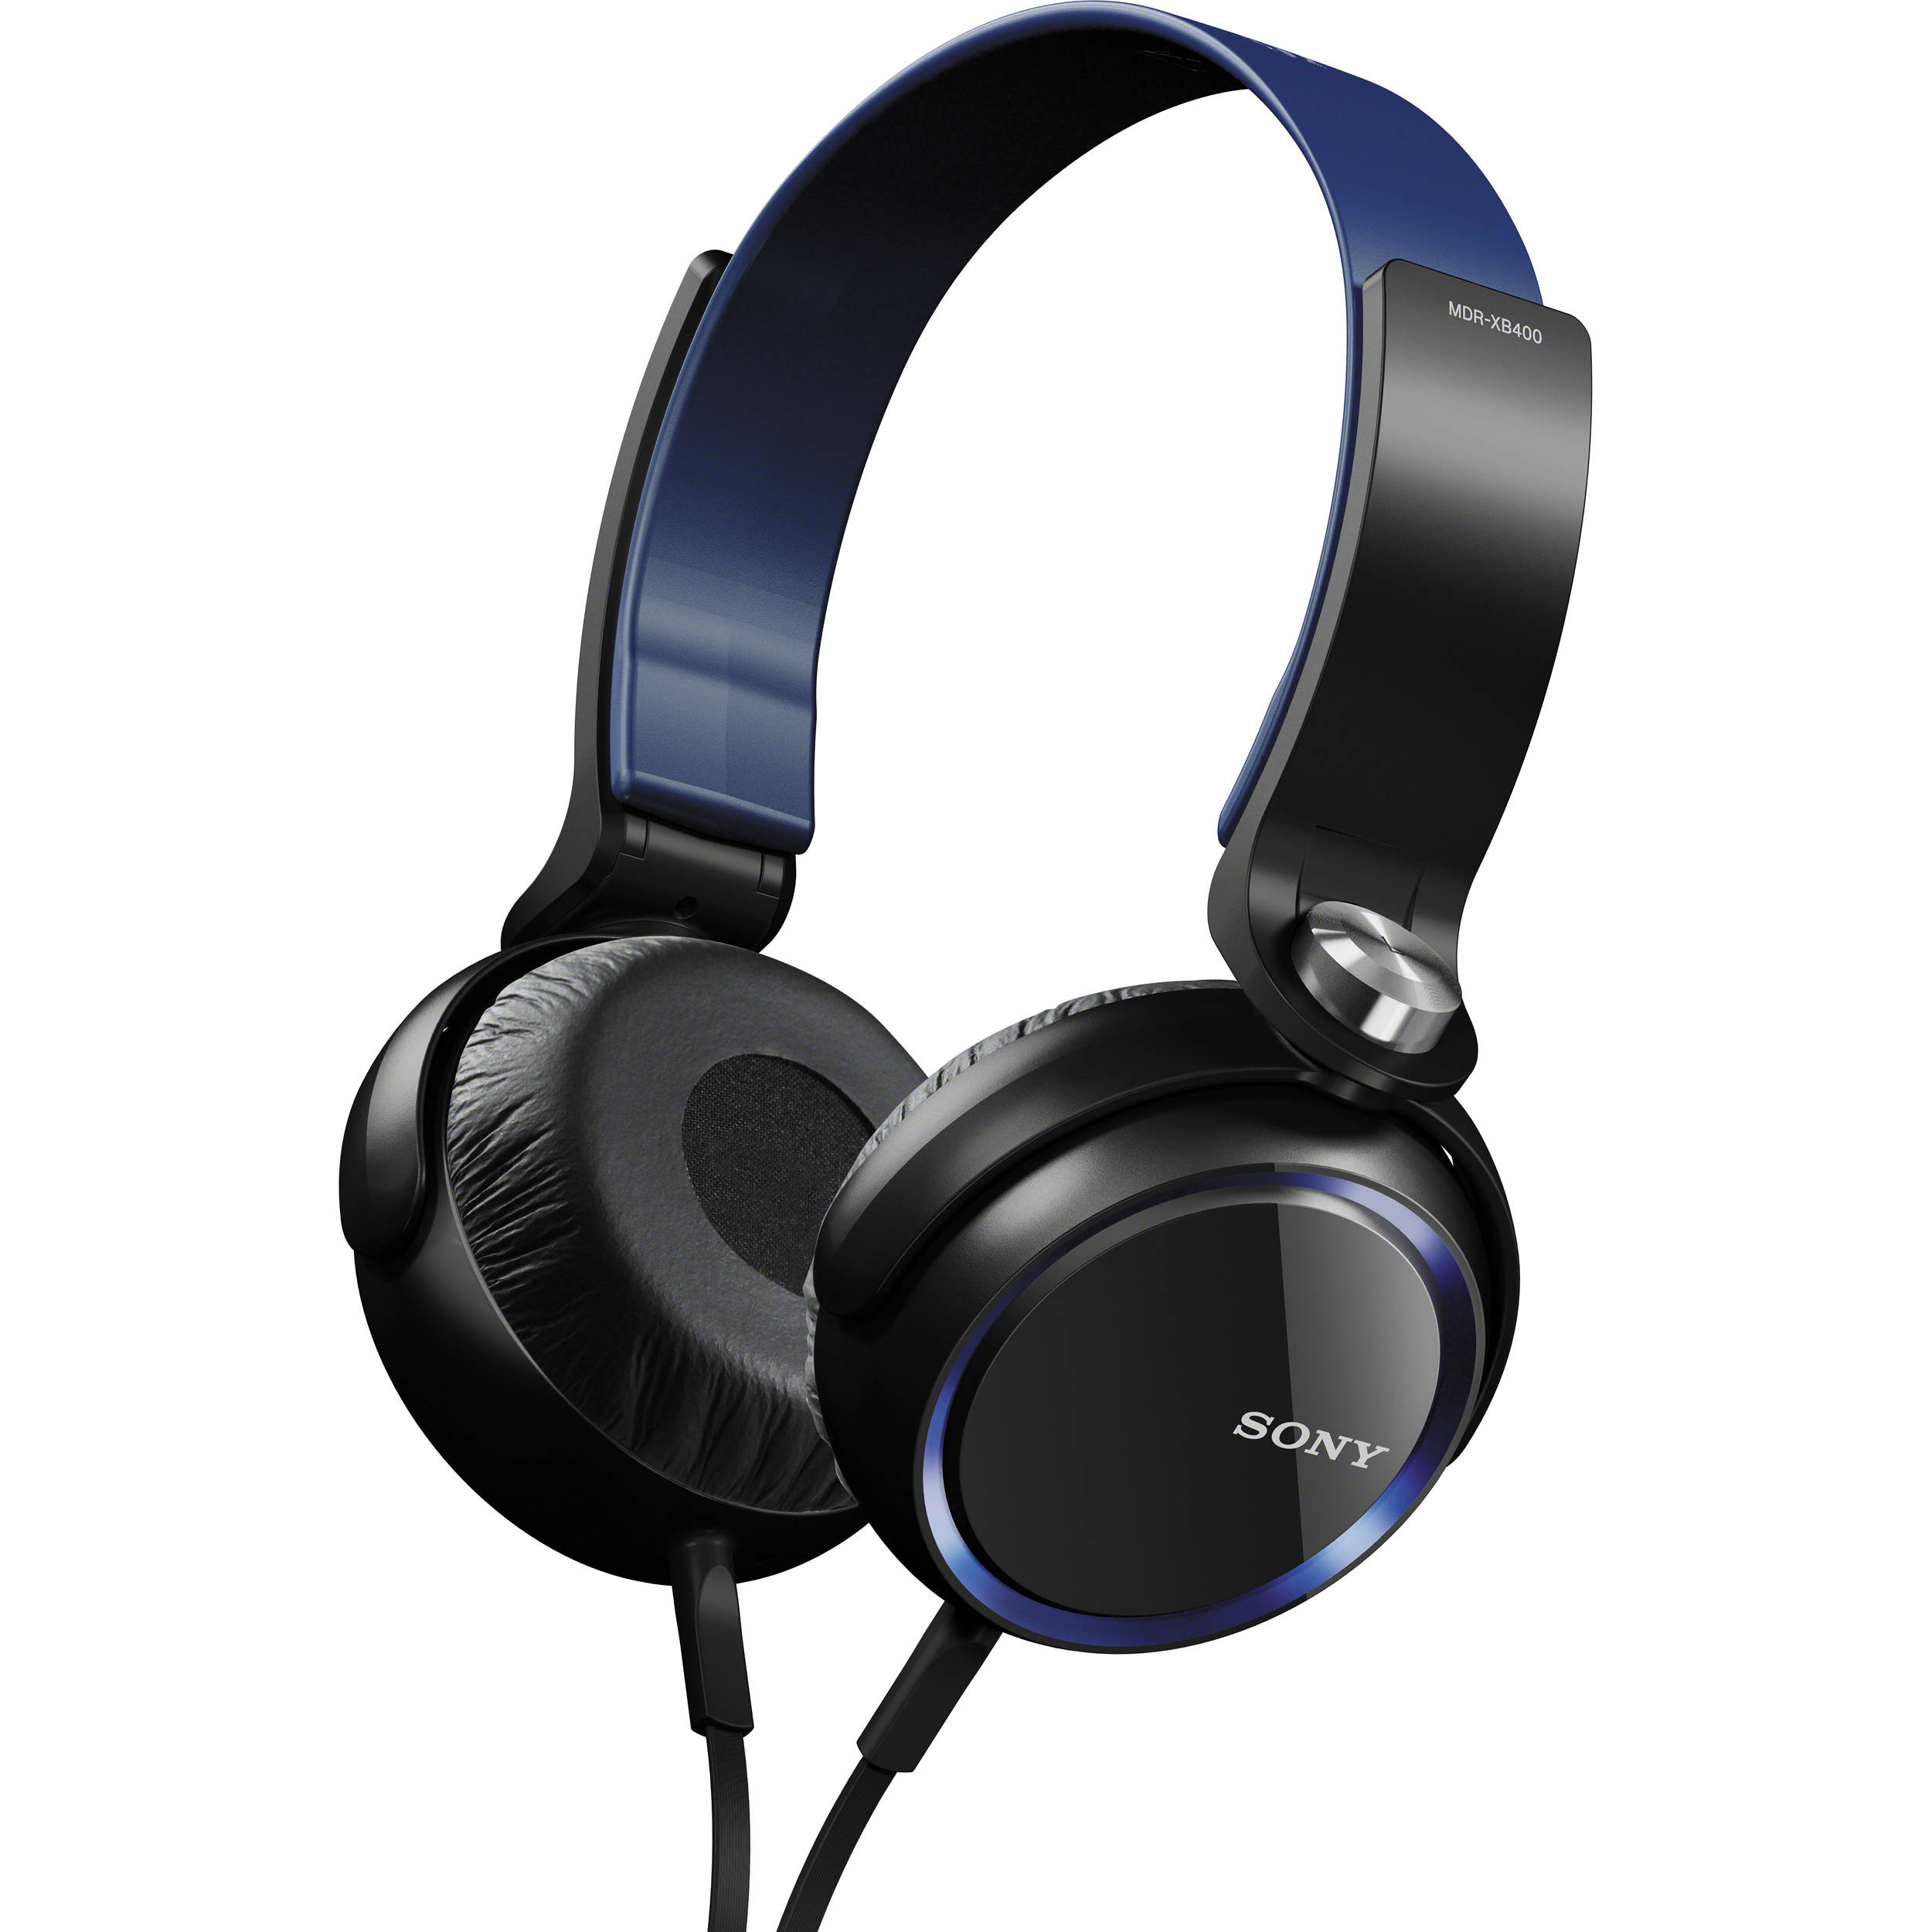 3da9c45475e Sony XB Series Extra Bass Headphones (Blue) MDRXB400/BLU B&H